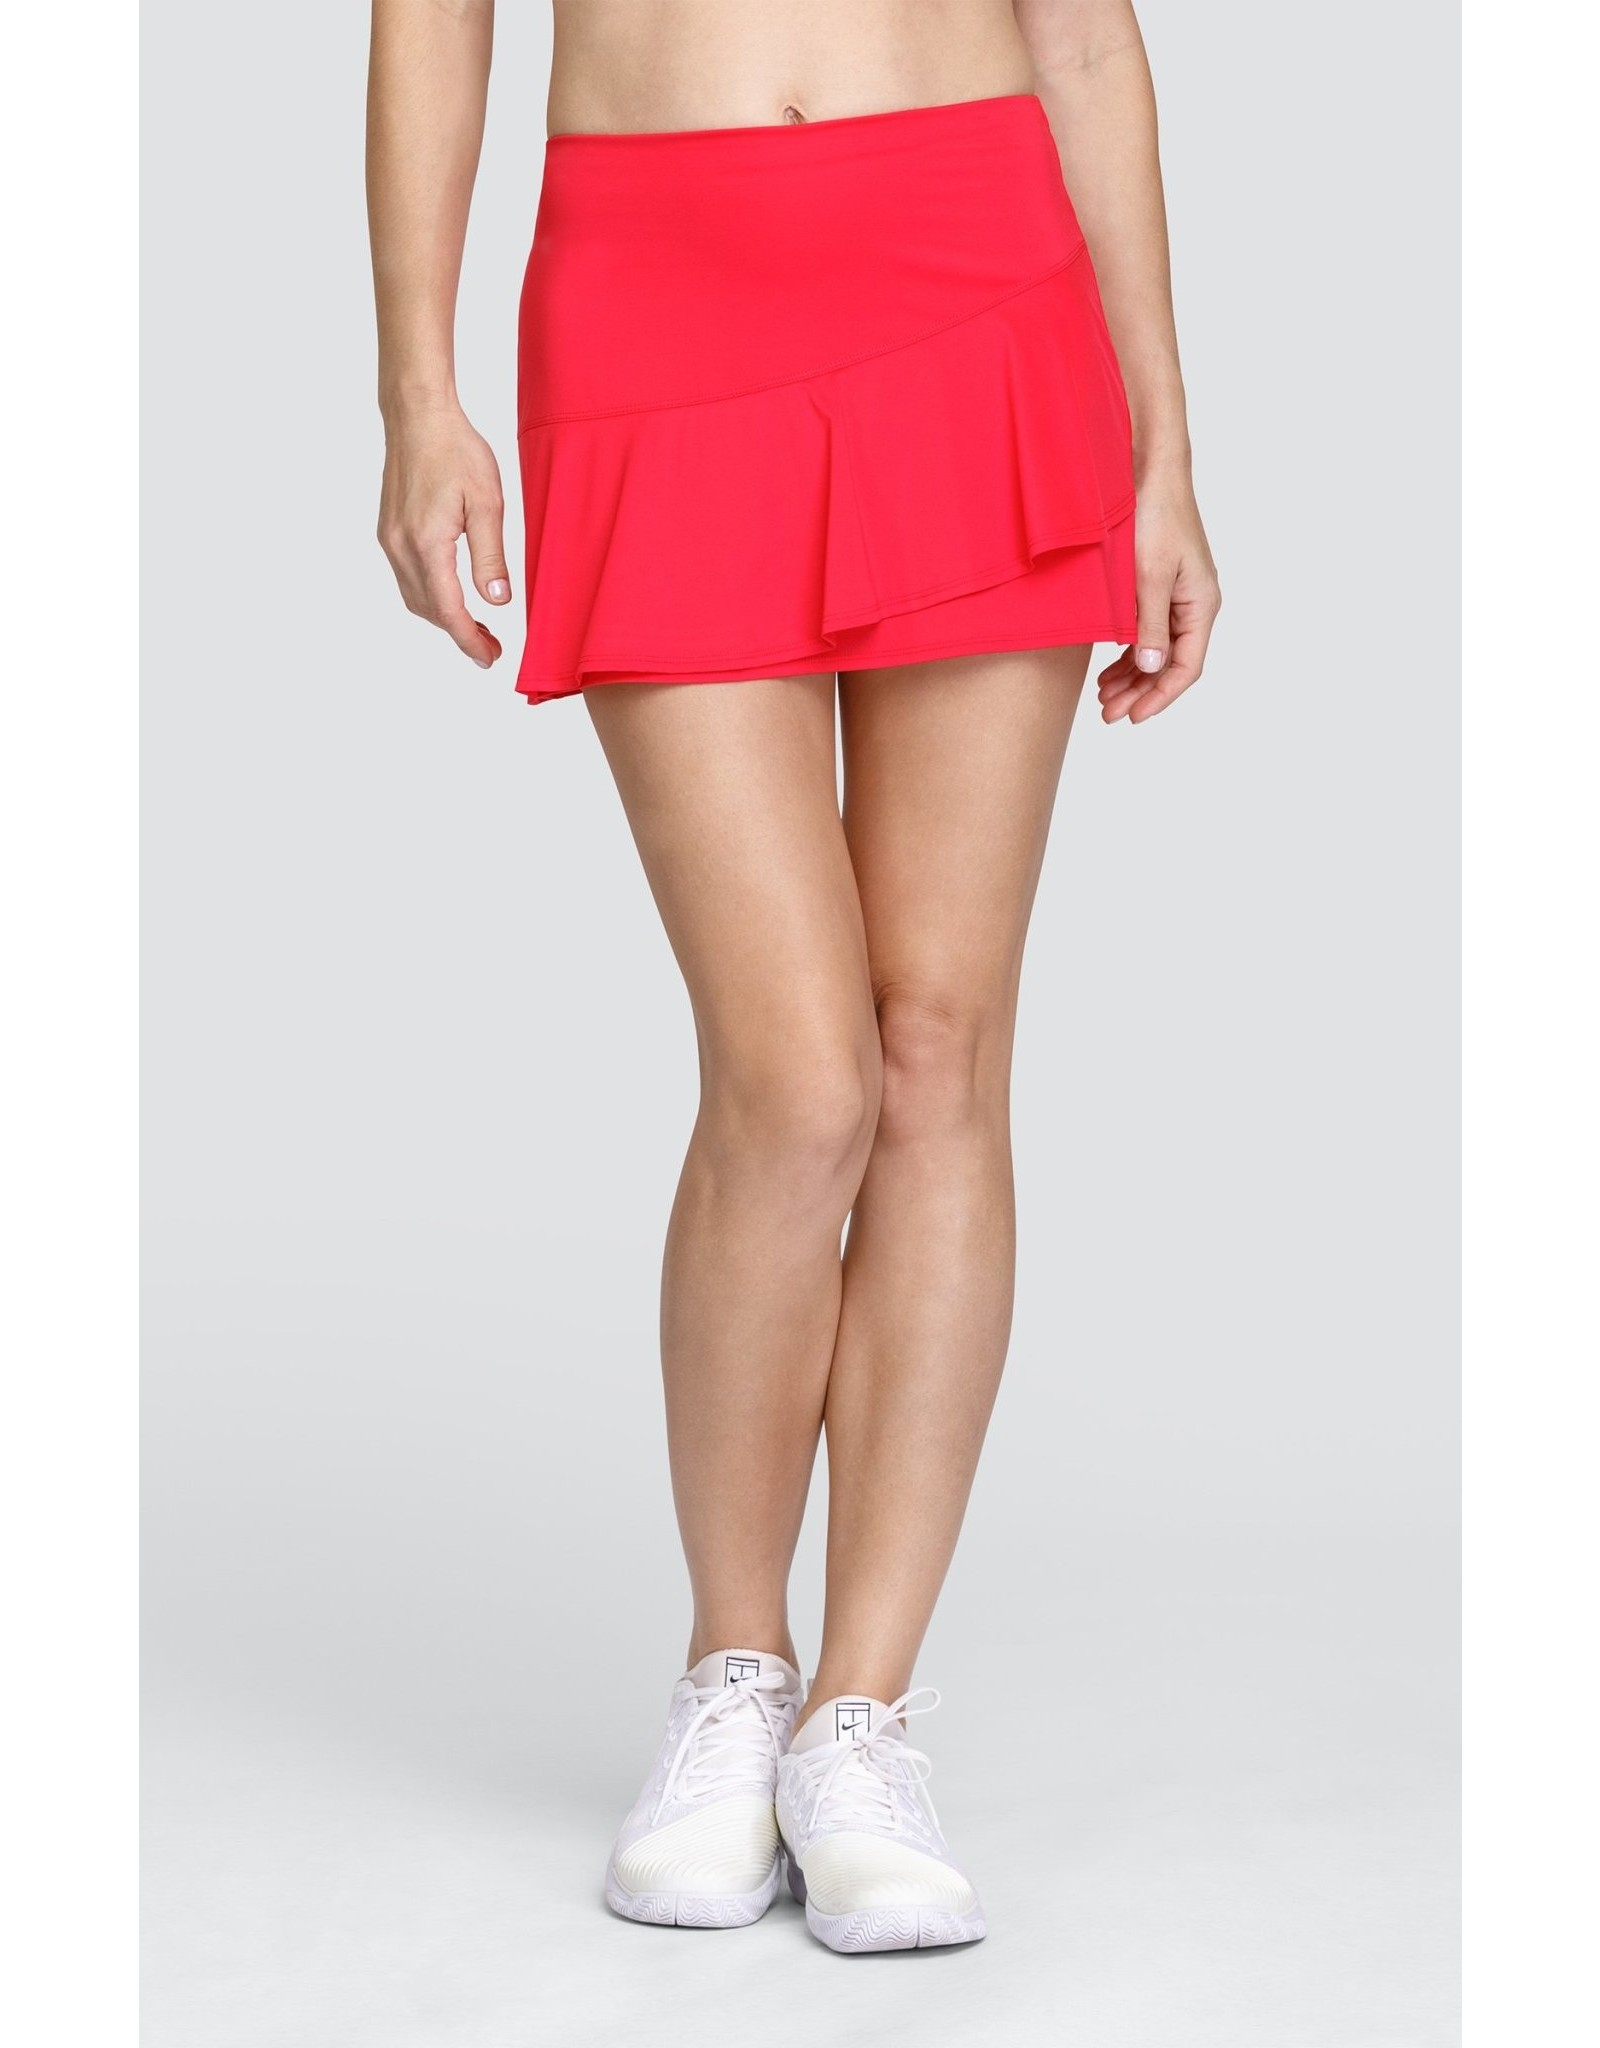 Asics Palm Court Caroline Skirt